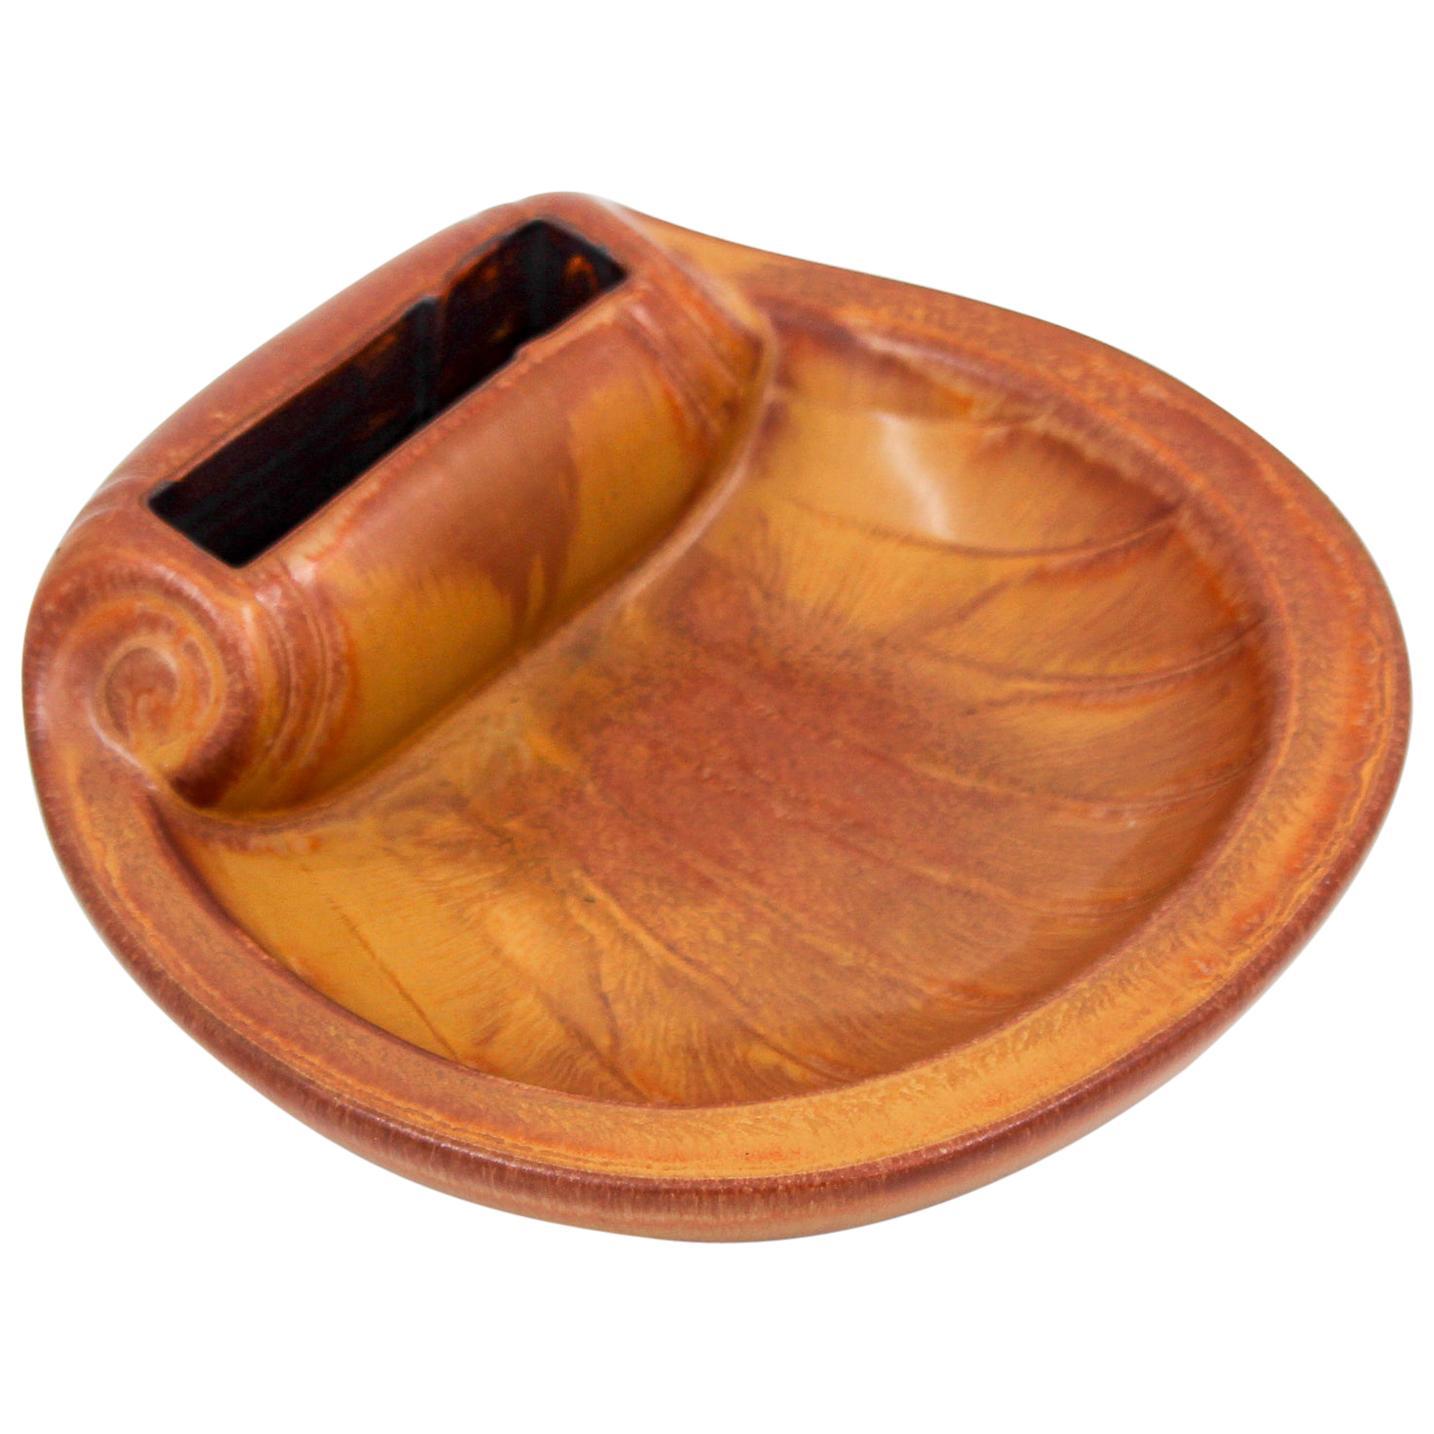 Midcentury Ceramic Bowl by Gunnar Nylund for Rörstrand, 1950s